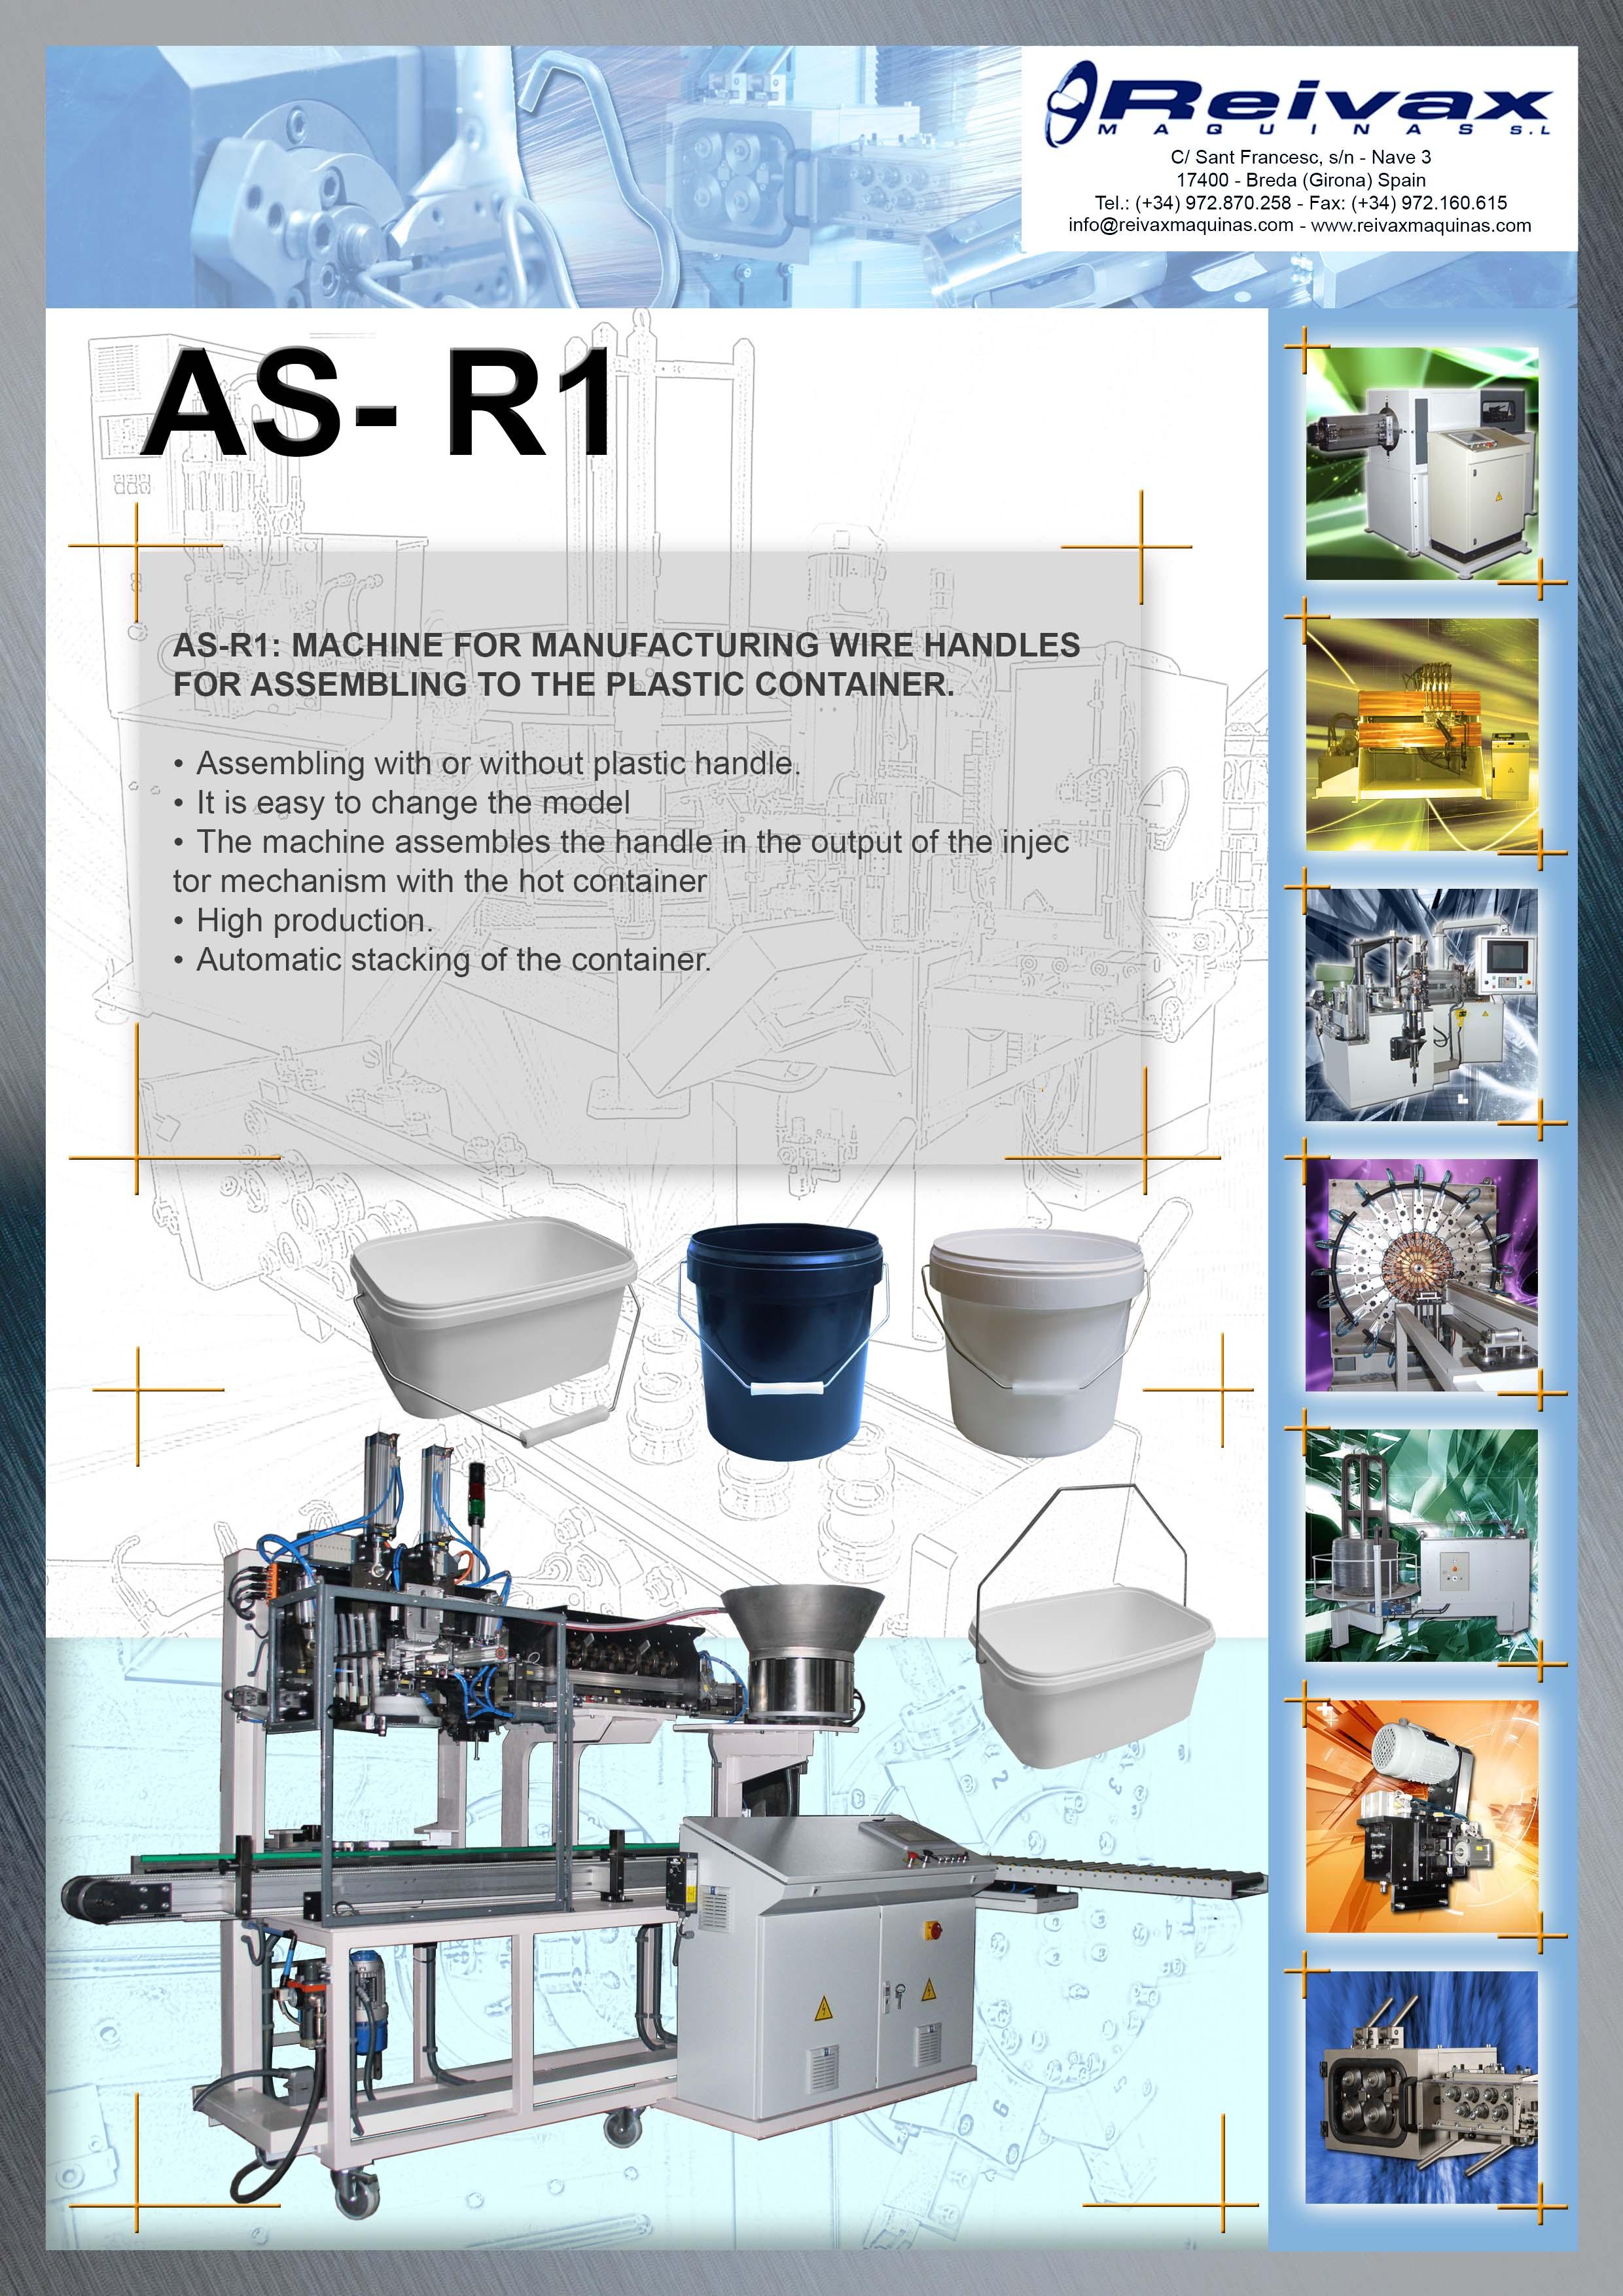 ReivaxMaquinas: Technical Details AS-R1